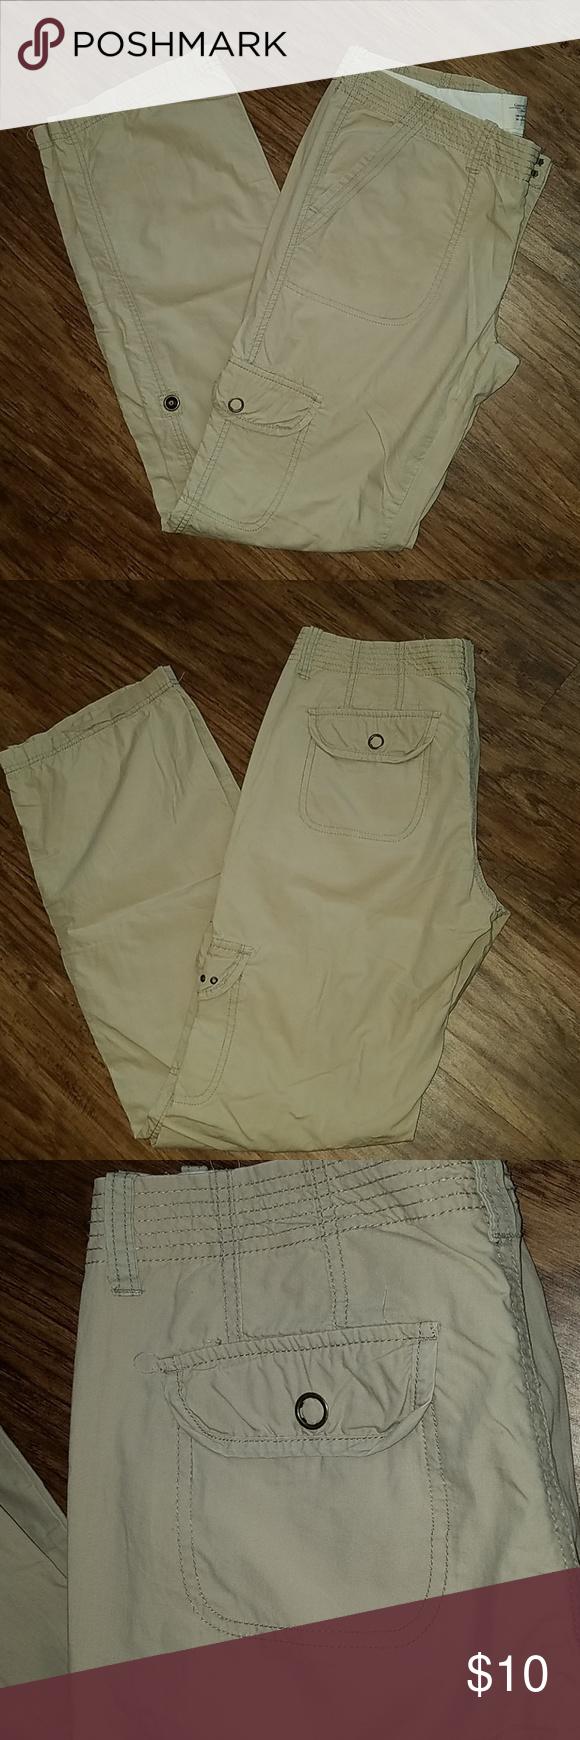 abb9e3016c7c Converse Cargo Pant Womens khaki Converse cargo pant. Thin pant with cargo  style pockets. Good pre-owned condition. Converse Pants Boot Cut   Flare